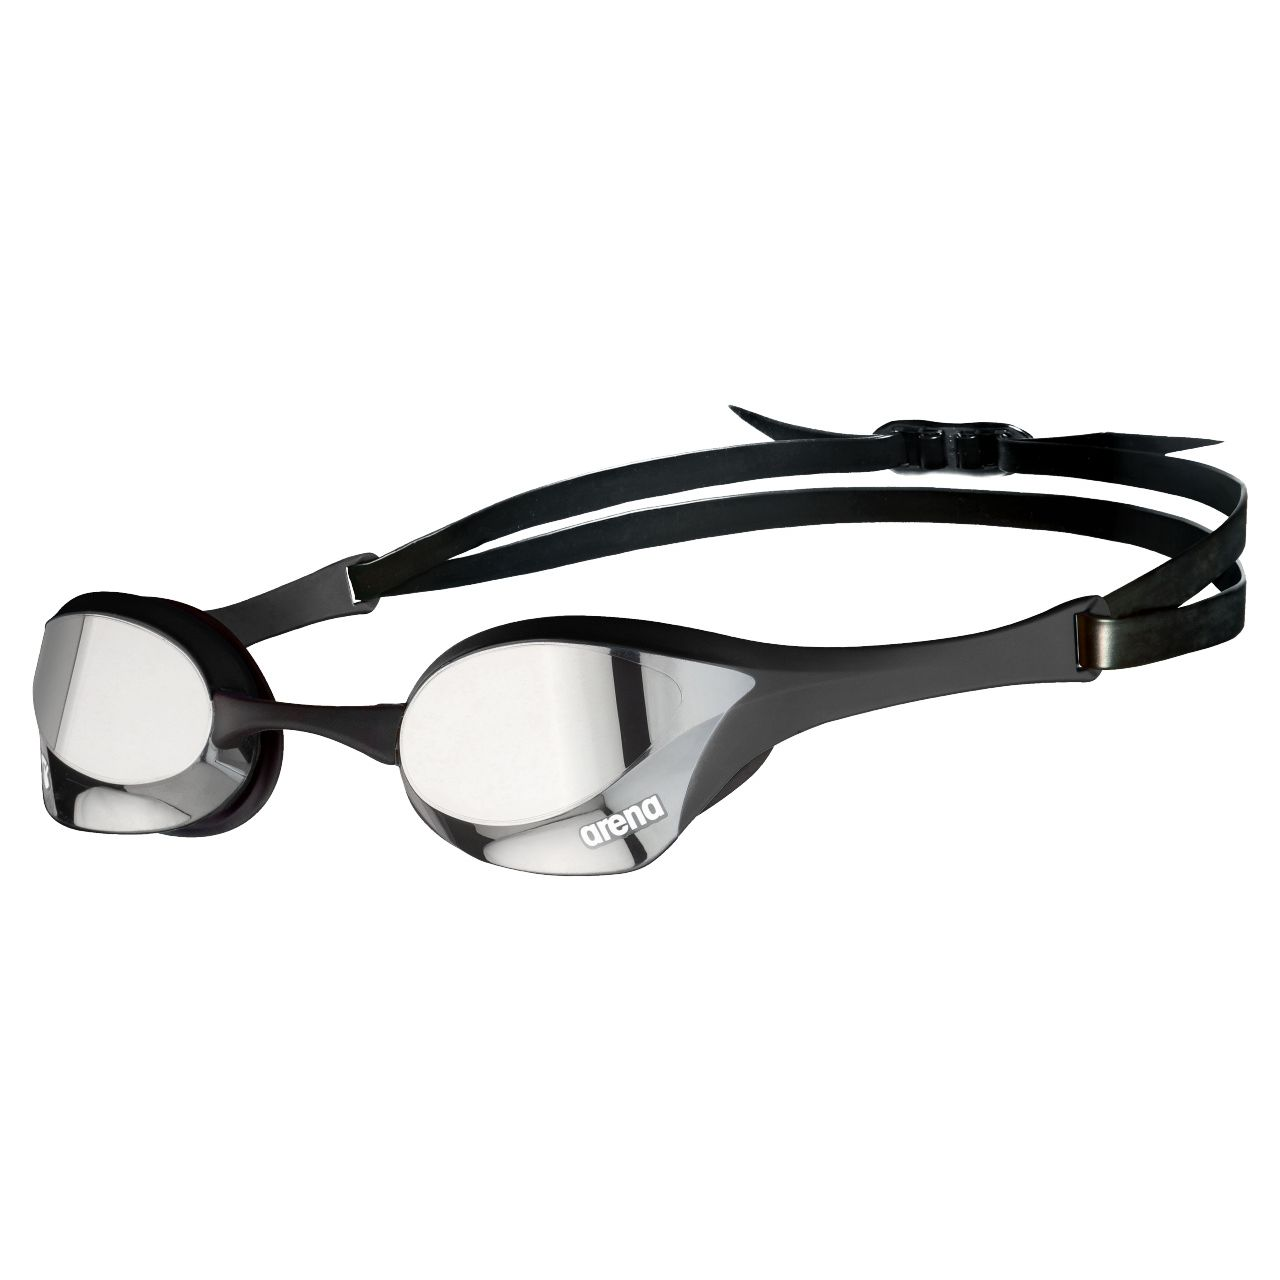 Goggles de Natación para Competición arena Unisex Cobra Ultra Swipe Mirror_6241